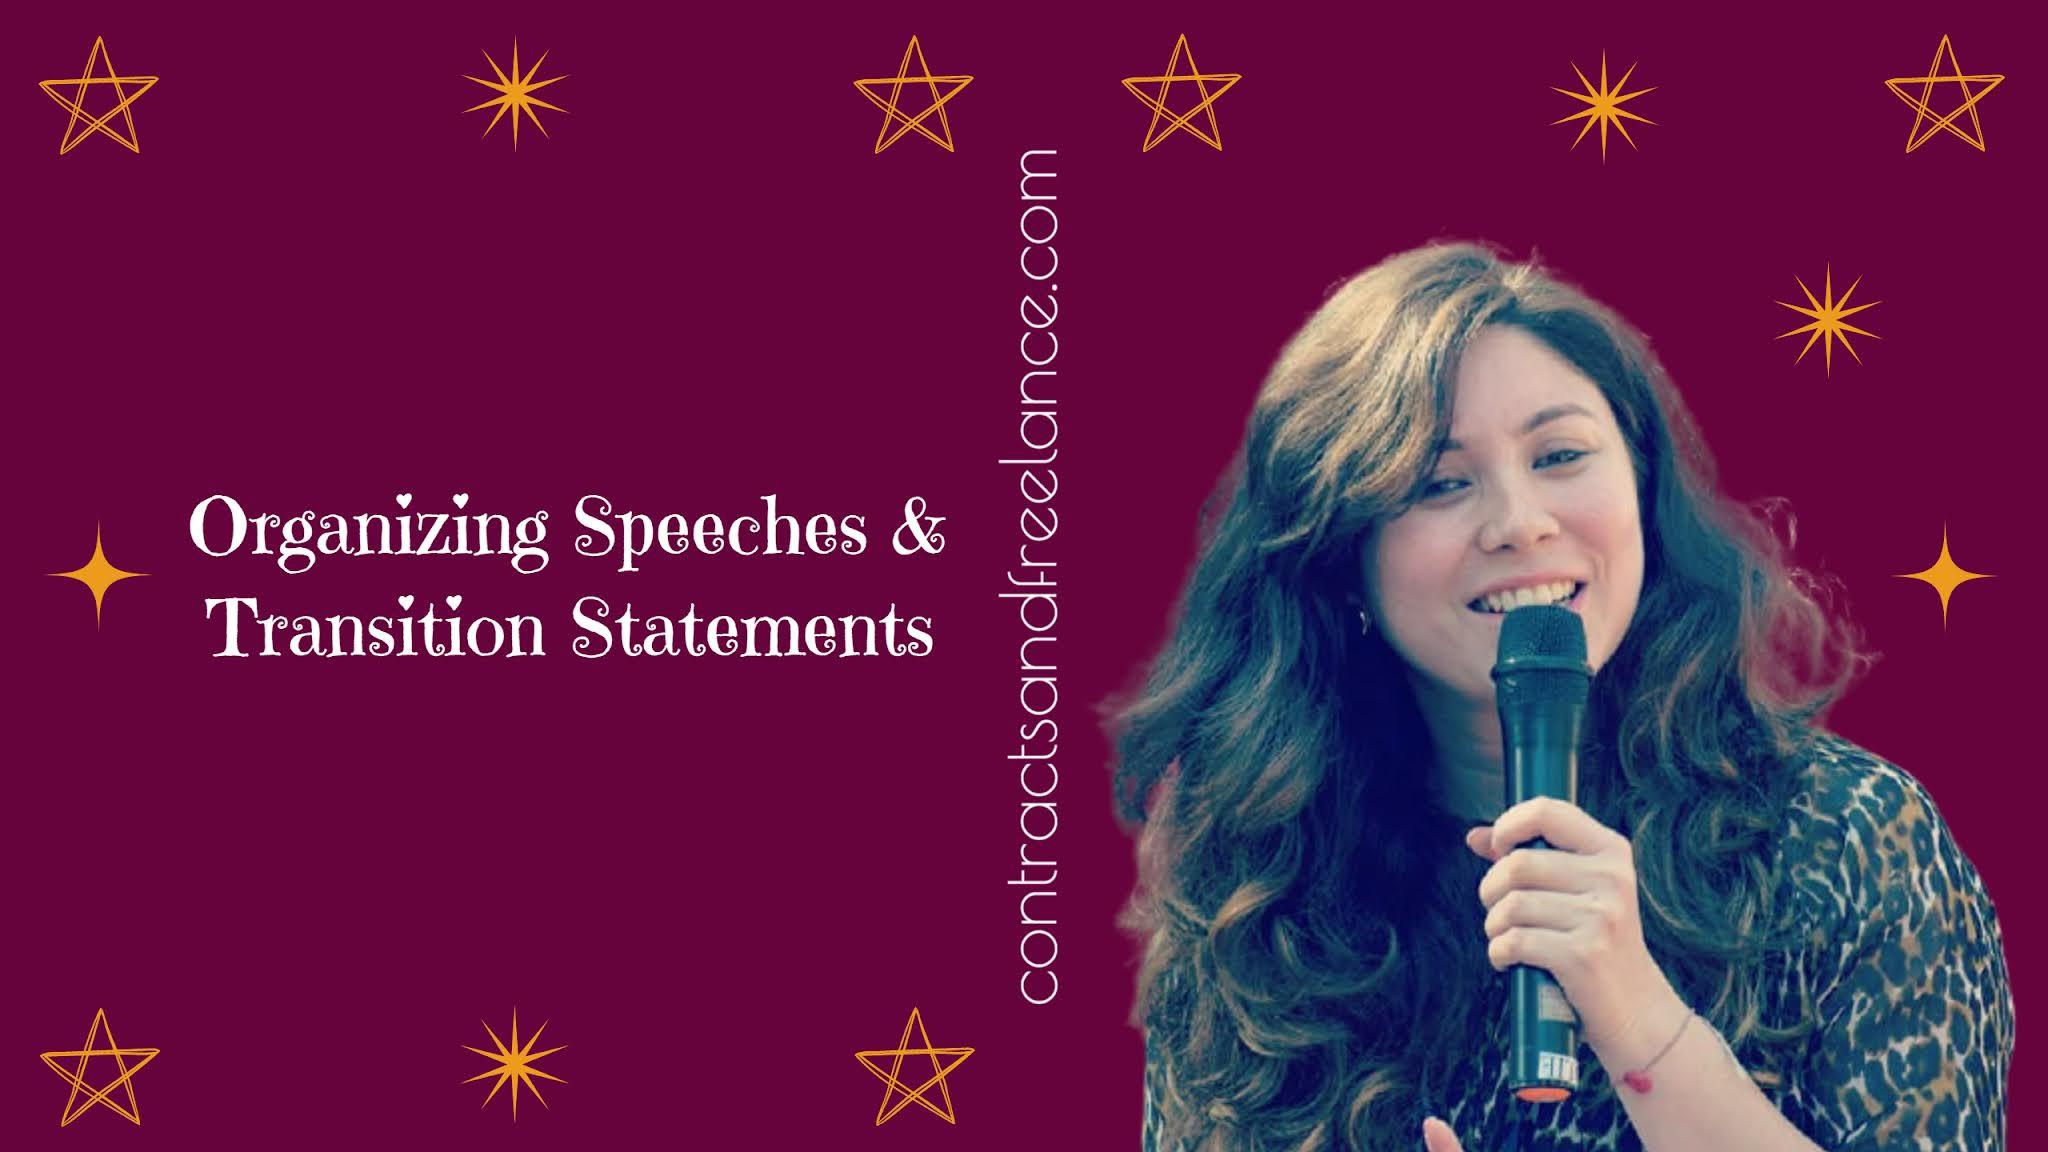 Public Speaking Tips: Organizing Speeches, Transition Statements   Nancy Shah